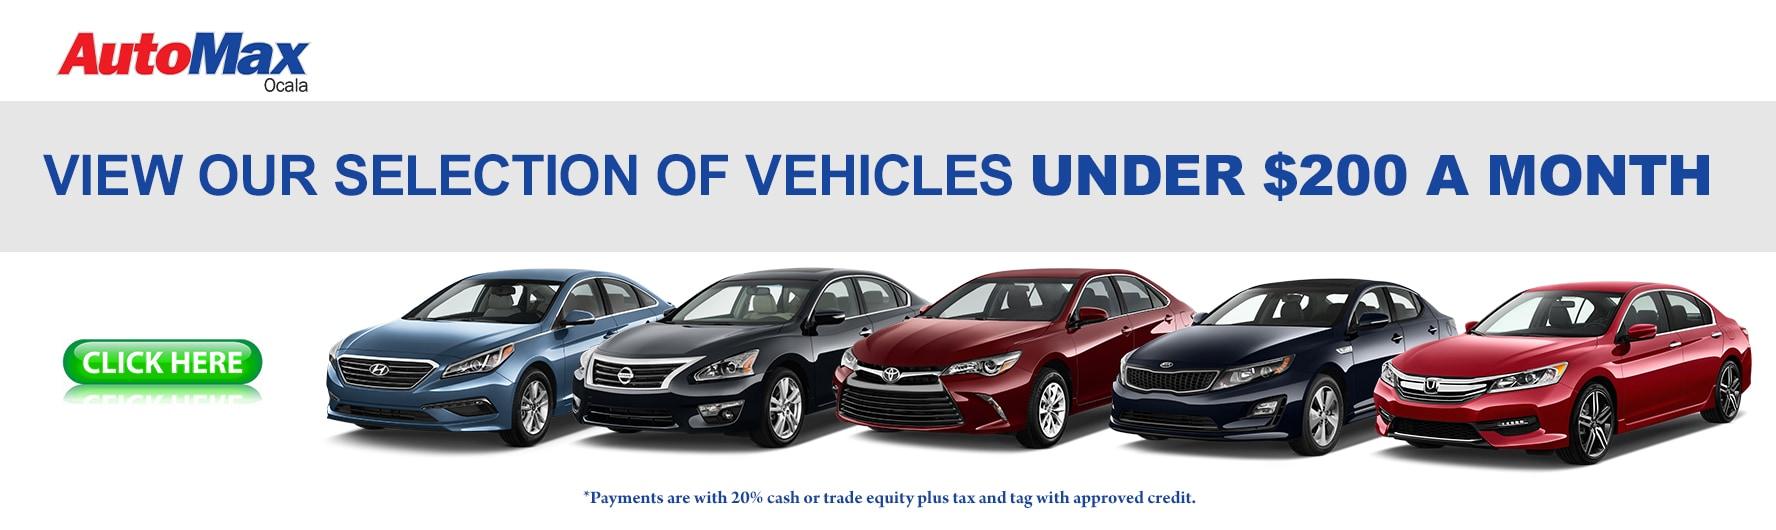 AutoMax Ocala | New dealership in Ocala, FL 34471